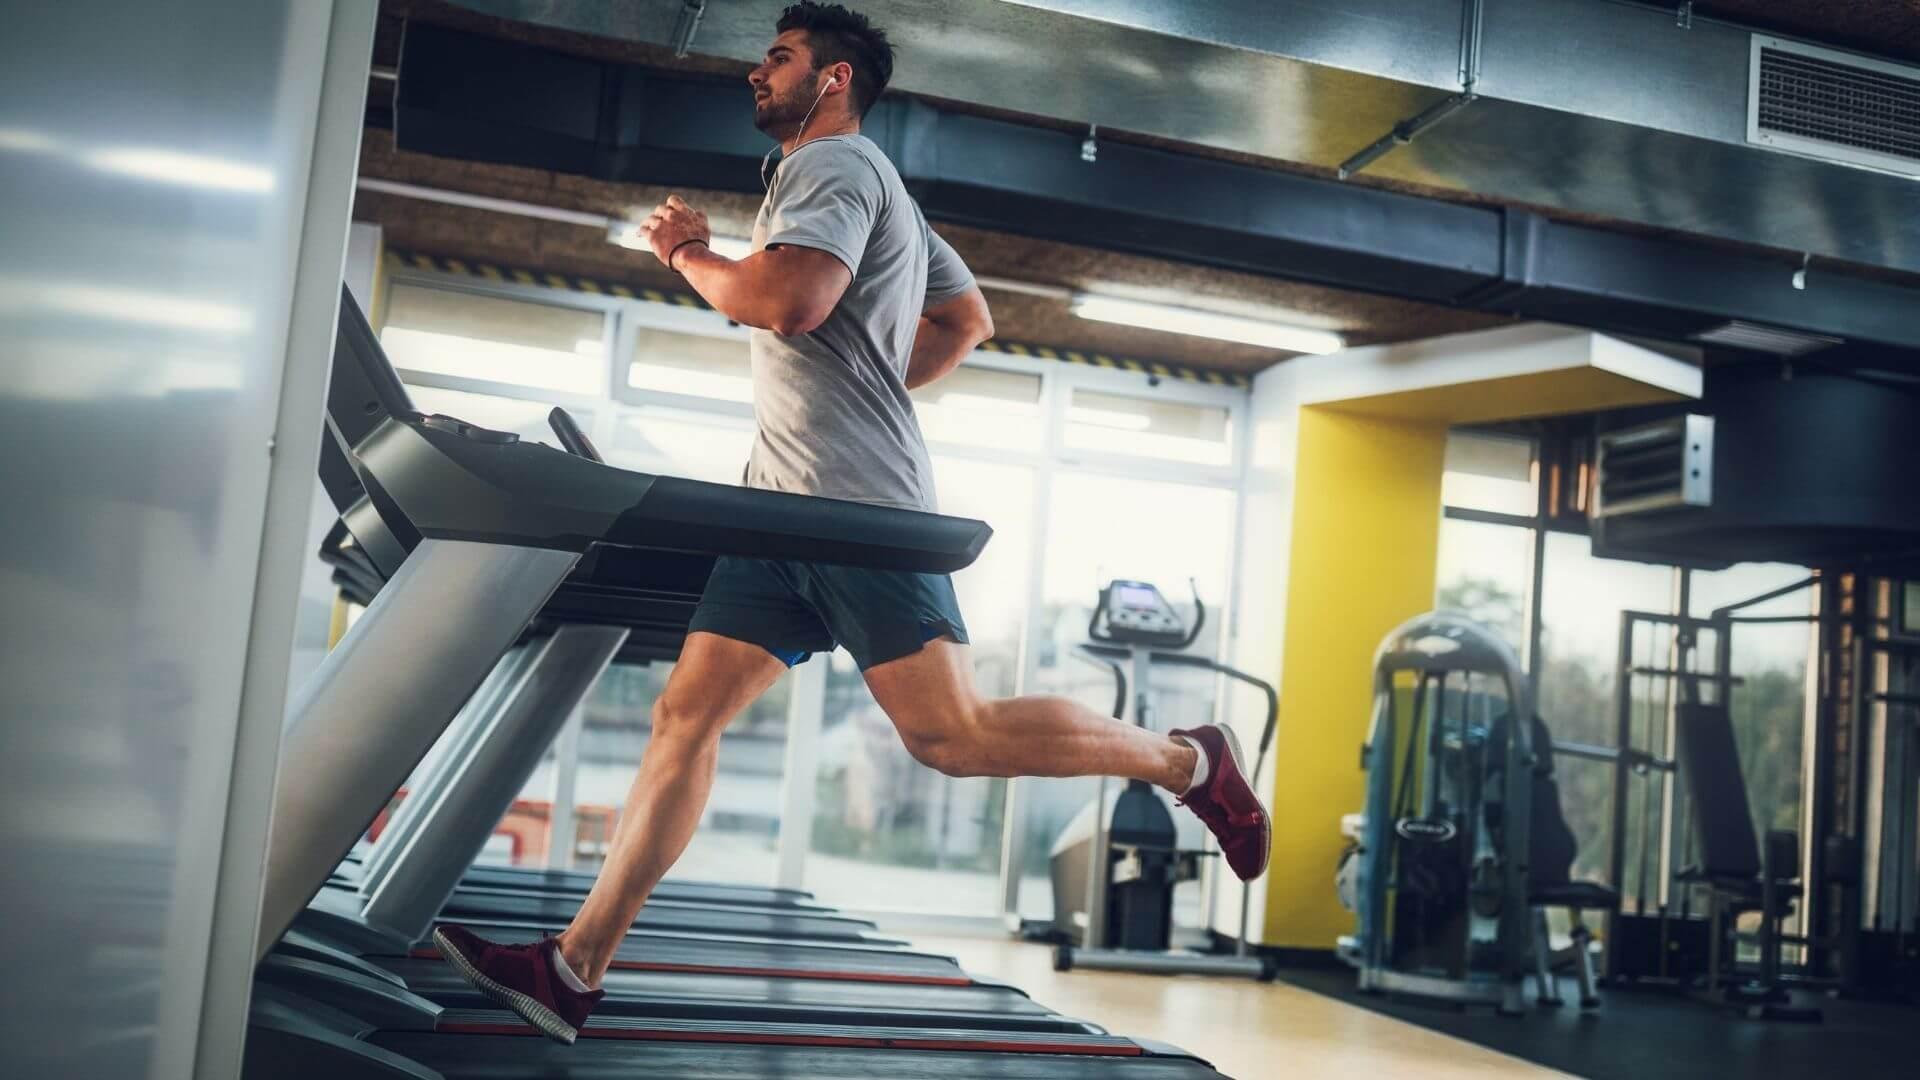 Man running on treadmill at Gym Plu